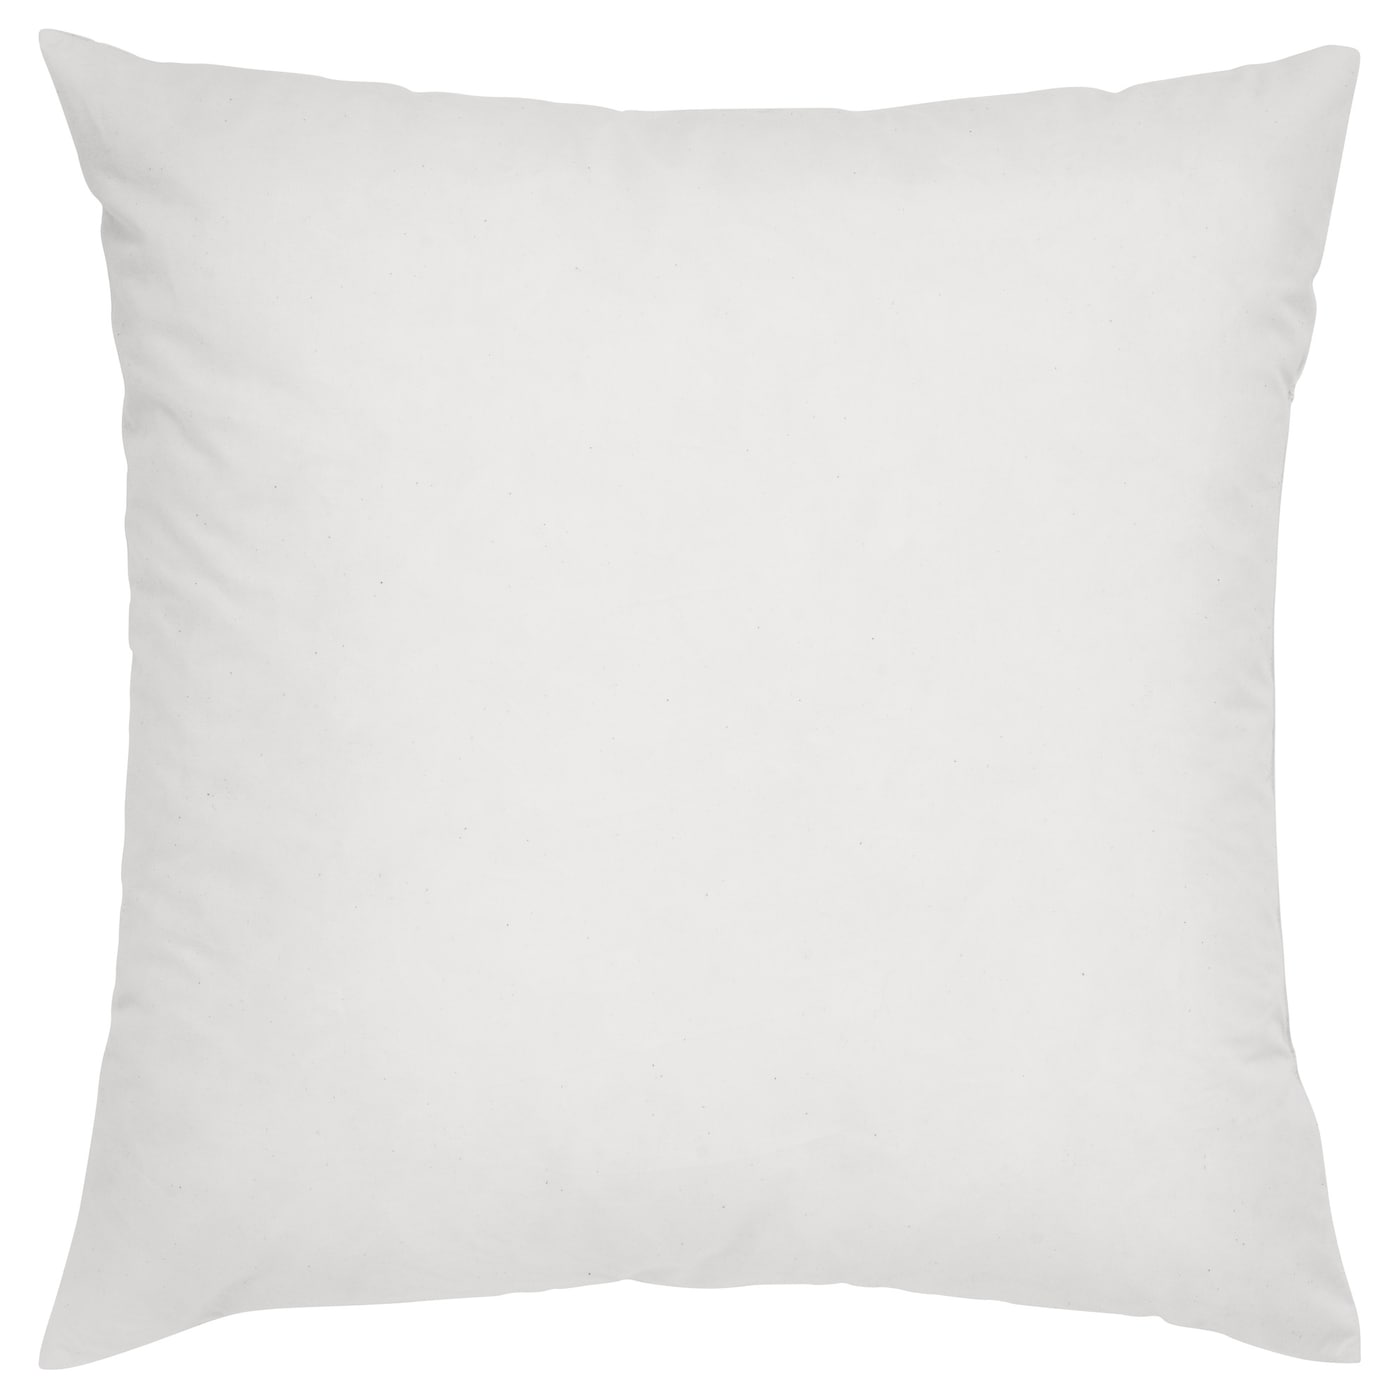 "NEW IKEA FJADRAR 20 X 20/"" OFF-WHITE INNER CUSHION,DUCK FEATHER FILLING"